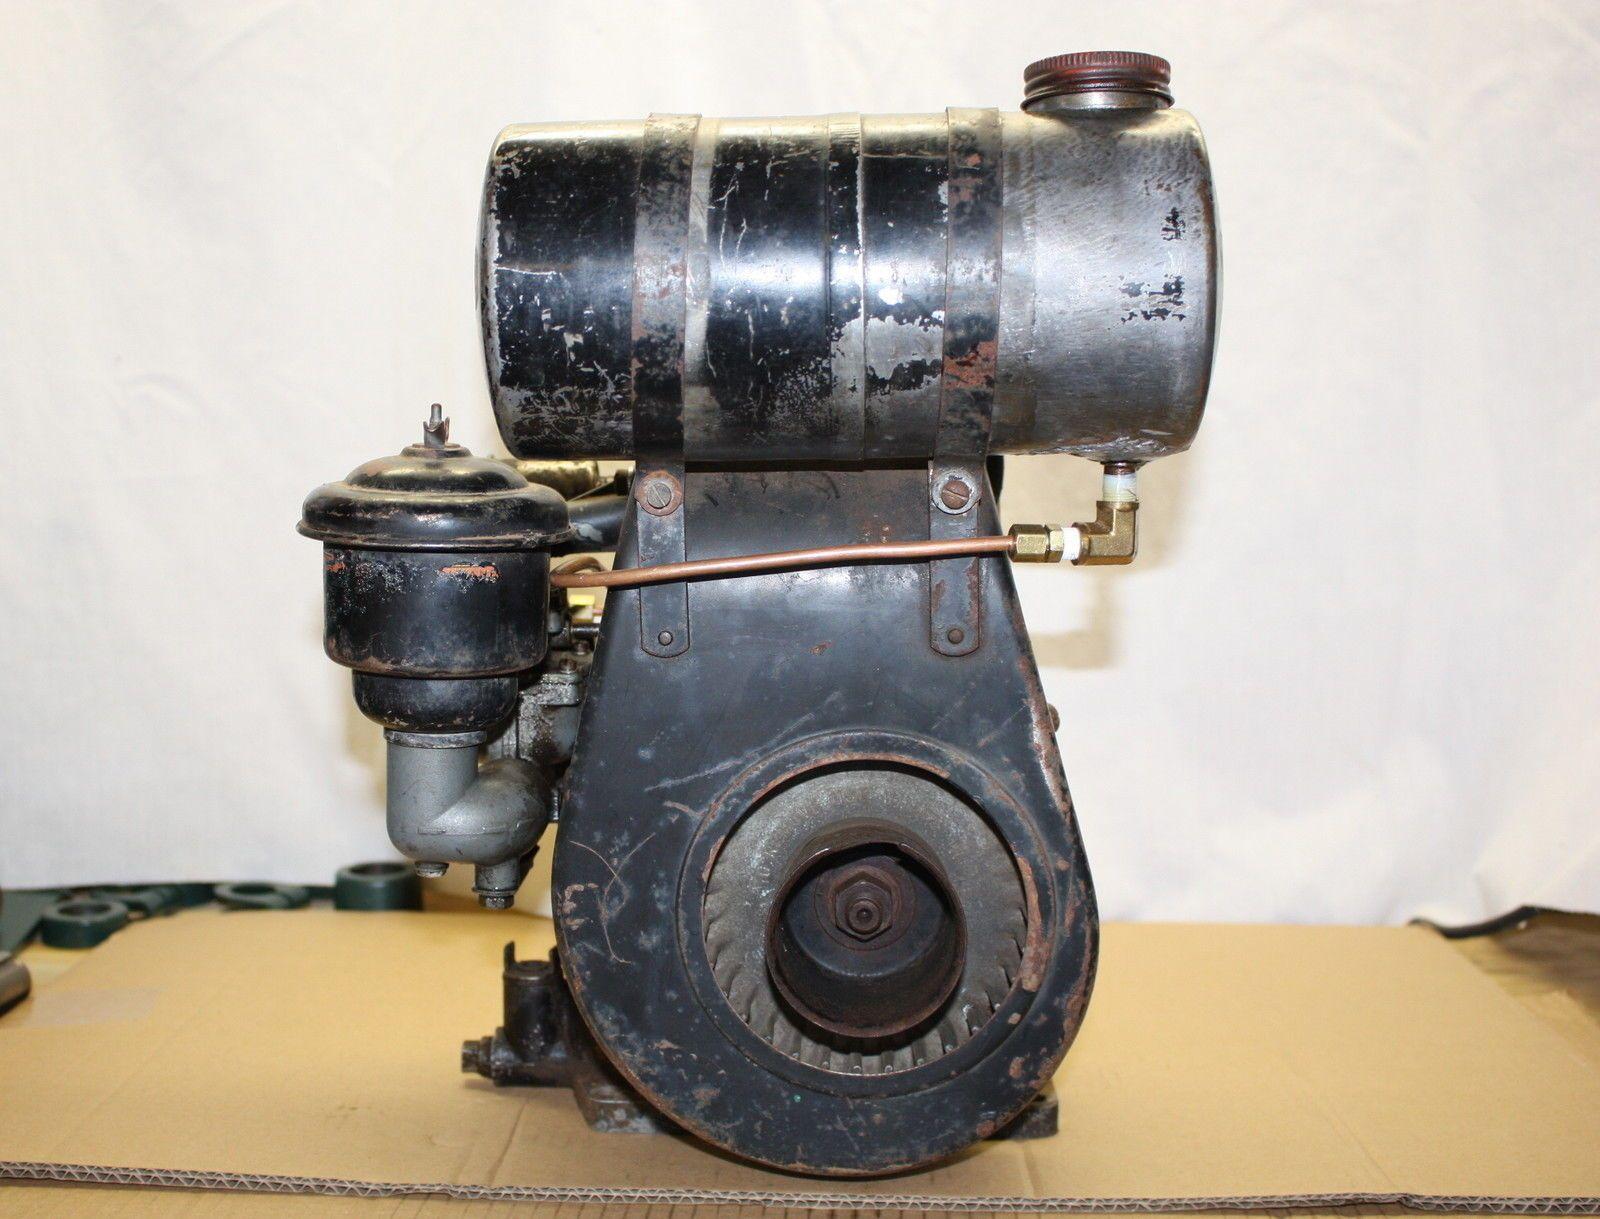 Details about Briggs & Stratton Model N Vintage 6/1947